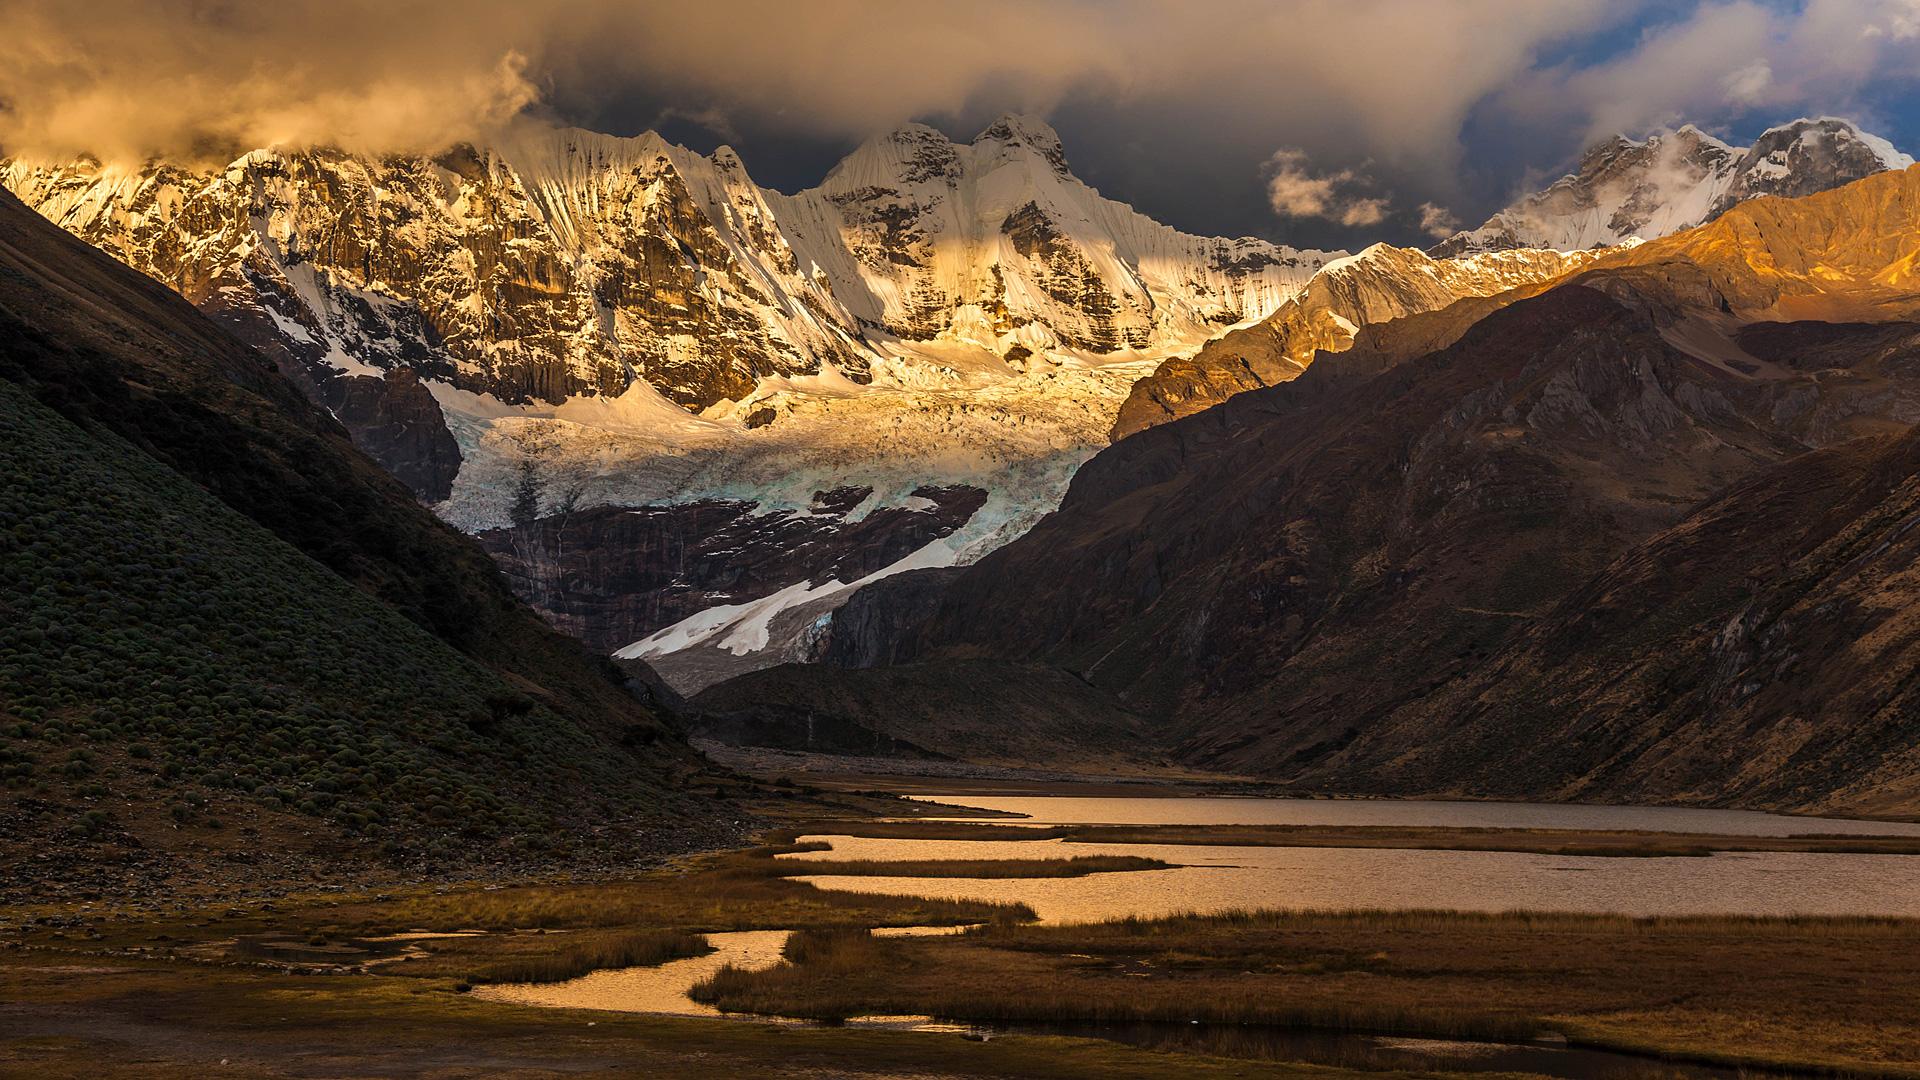 Blick auf den Lago Jahuacocha in der Cordillera Huahuash